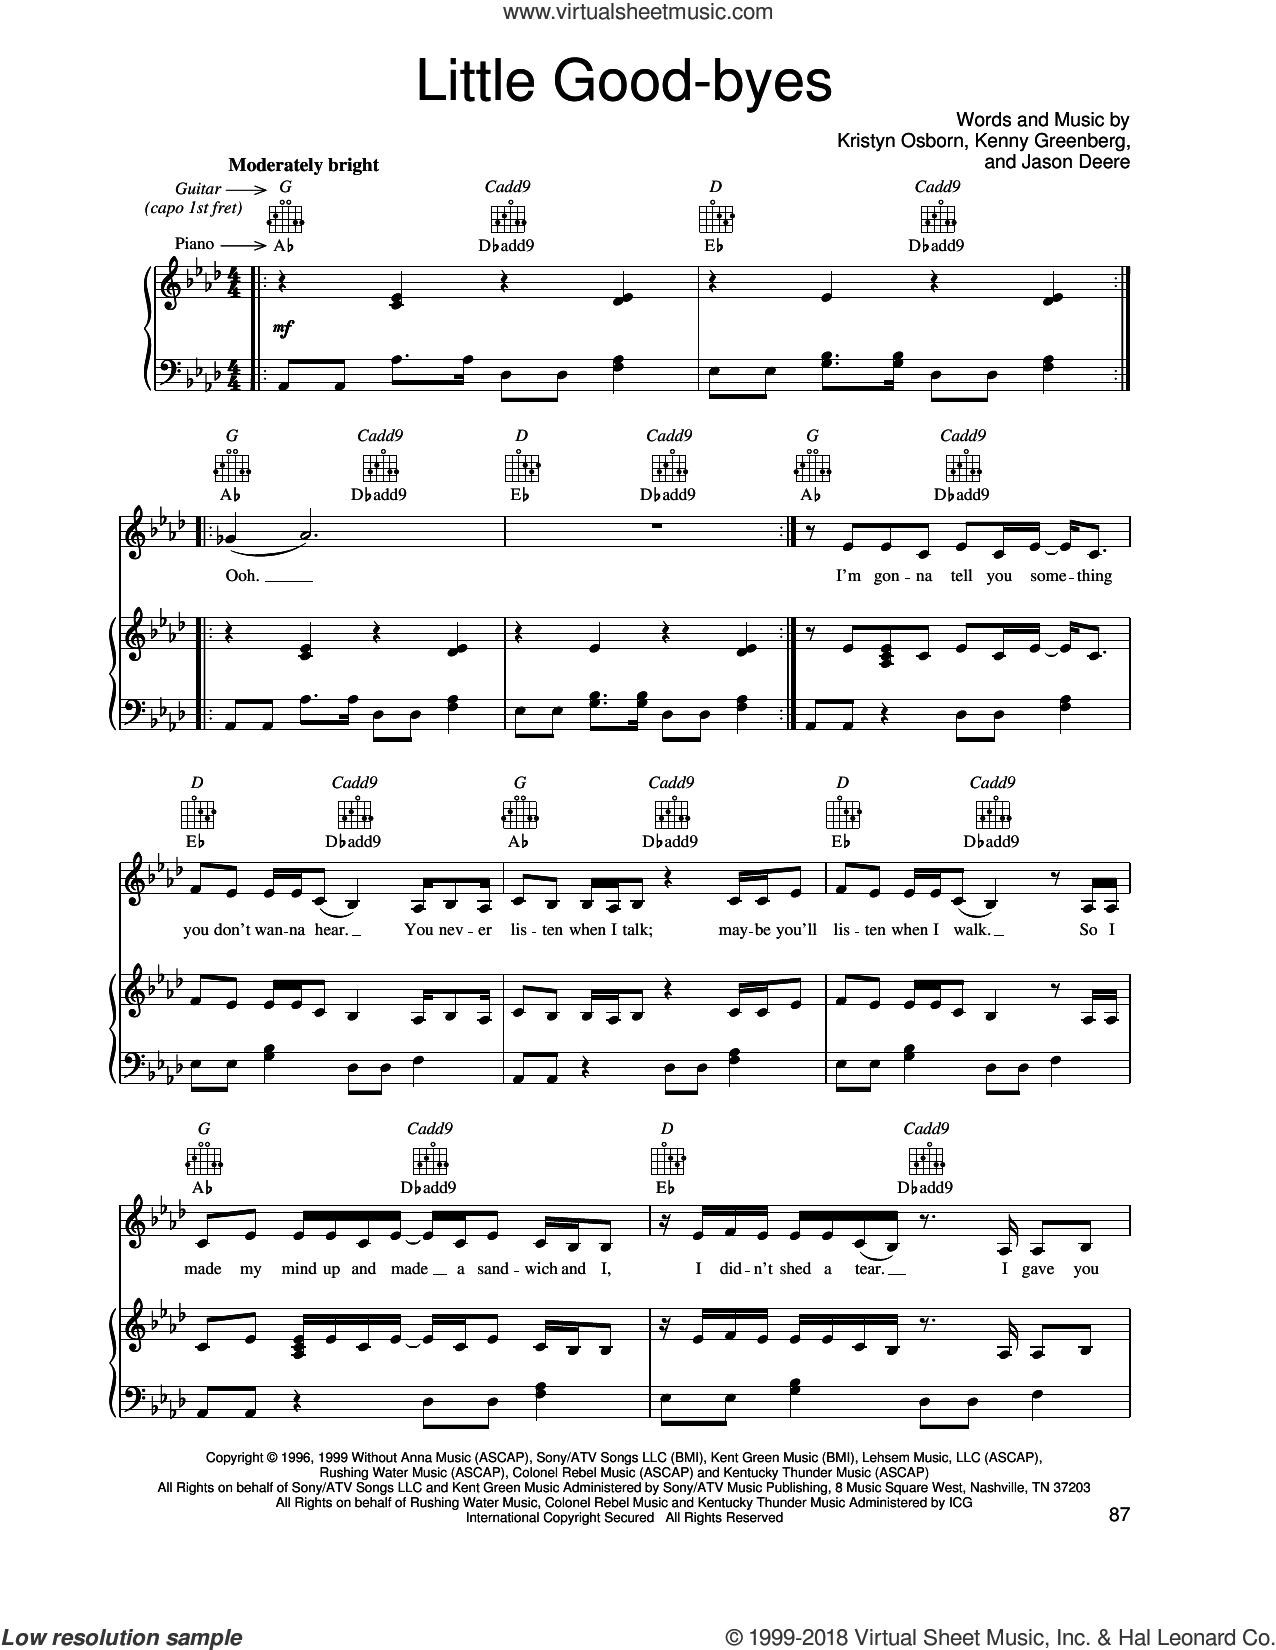 Little Good-byes sheet music for voice, piano or guitar by SHeDAISY, Jason Deere, Kenny Greenberg and Kristyn Osborn, intermediate skill level